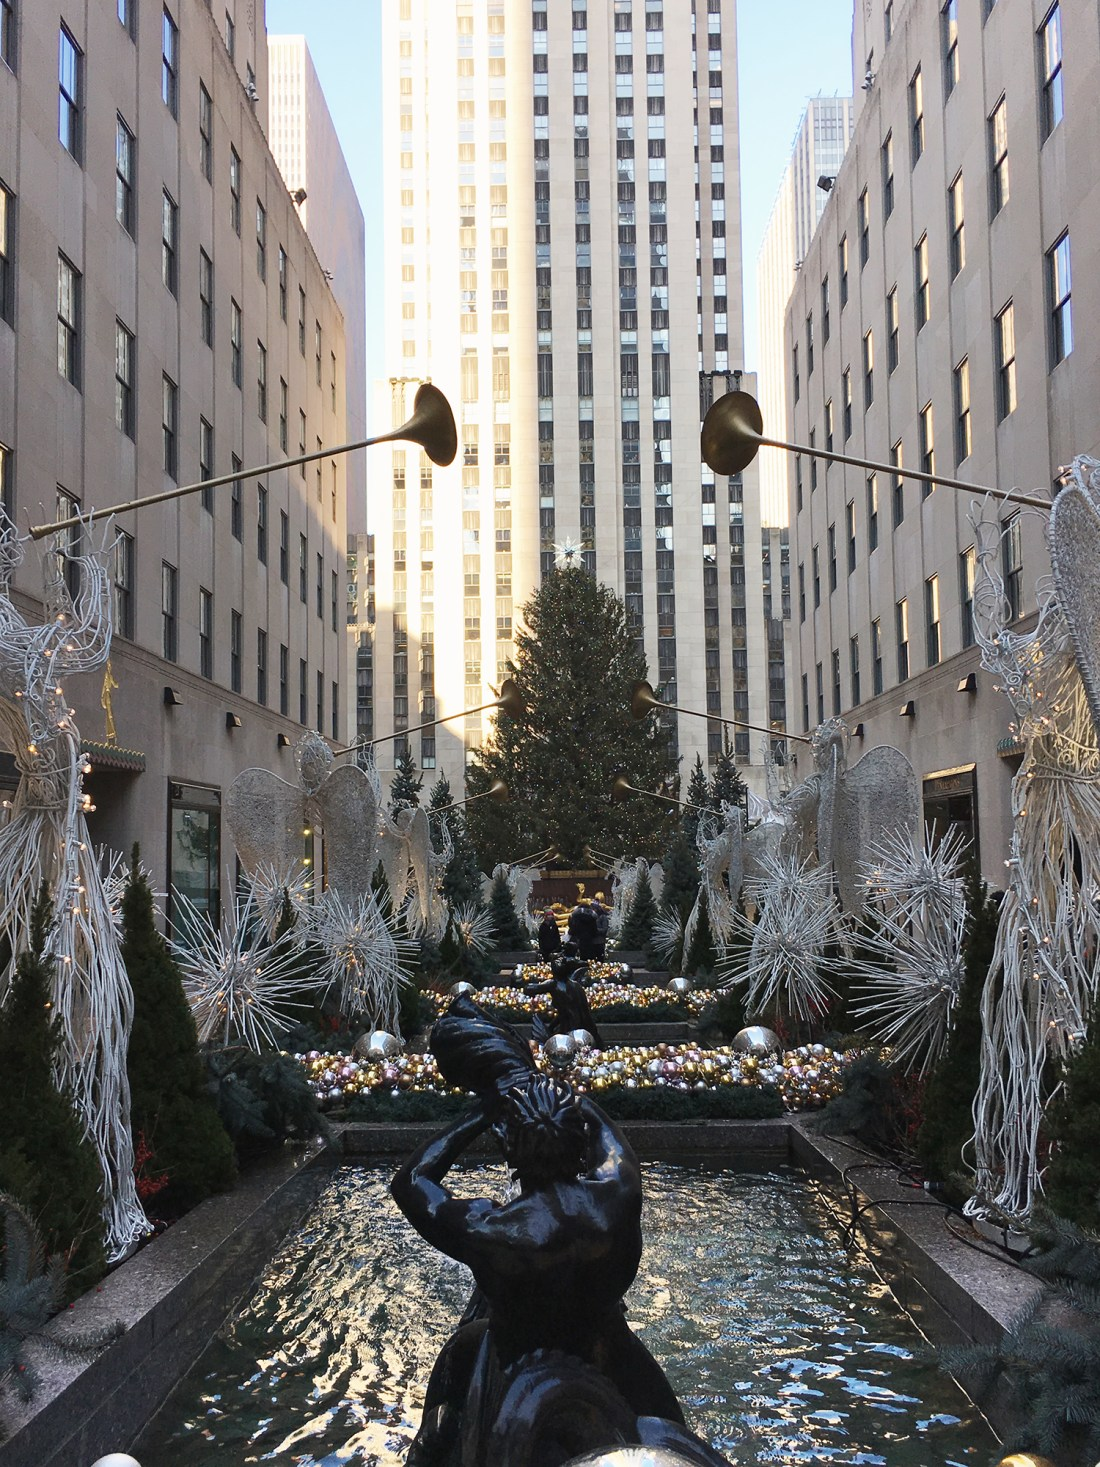 Rockefeller Center Christmas Tree, A Good Hue